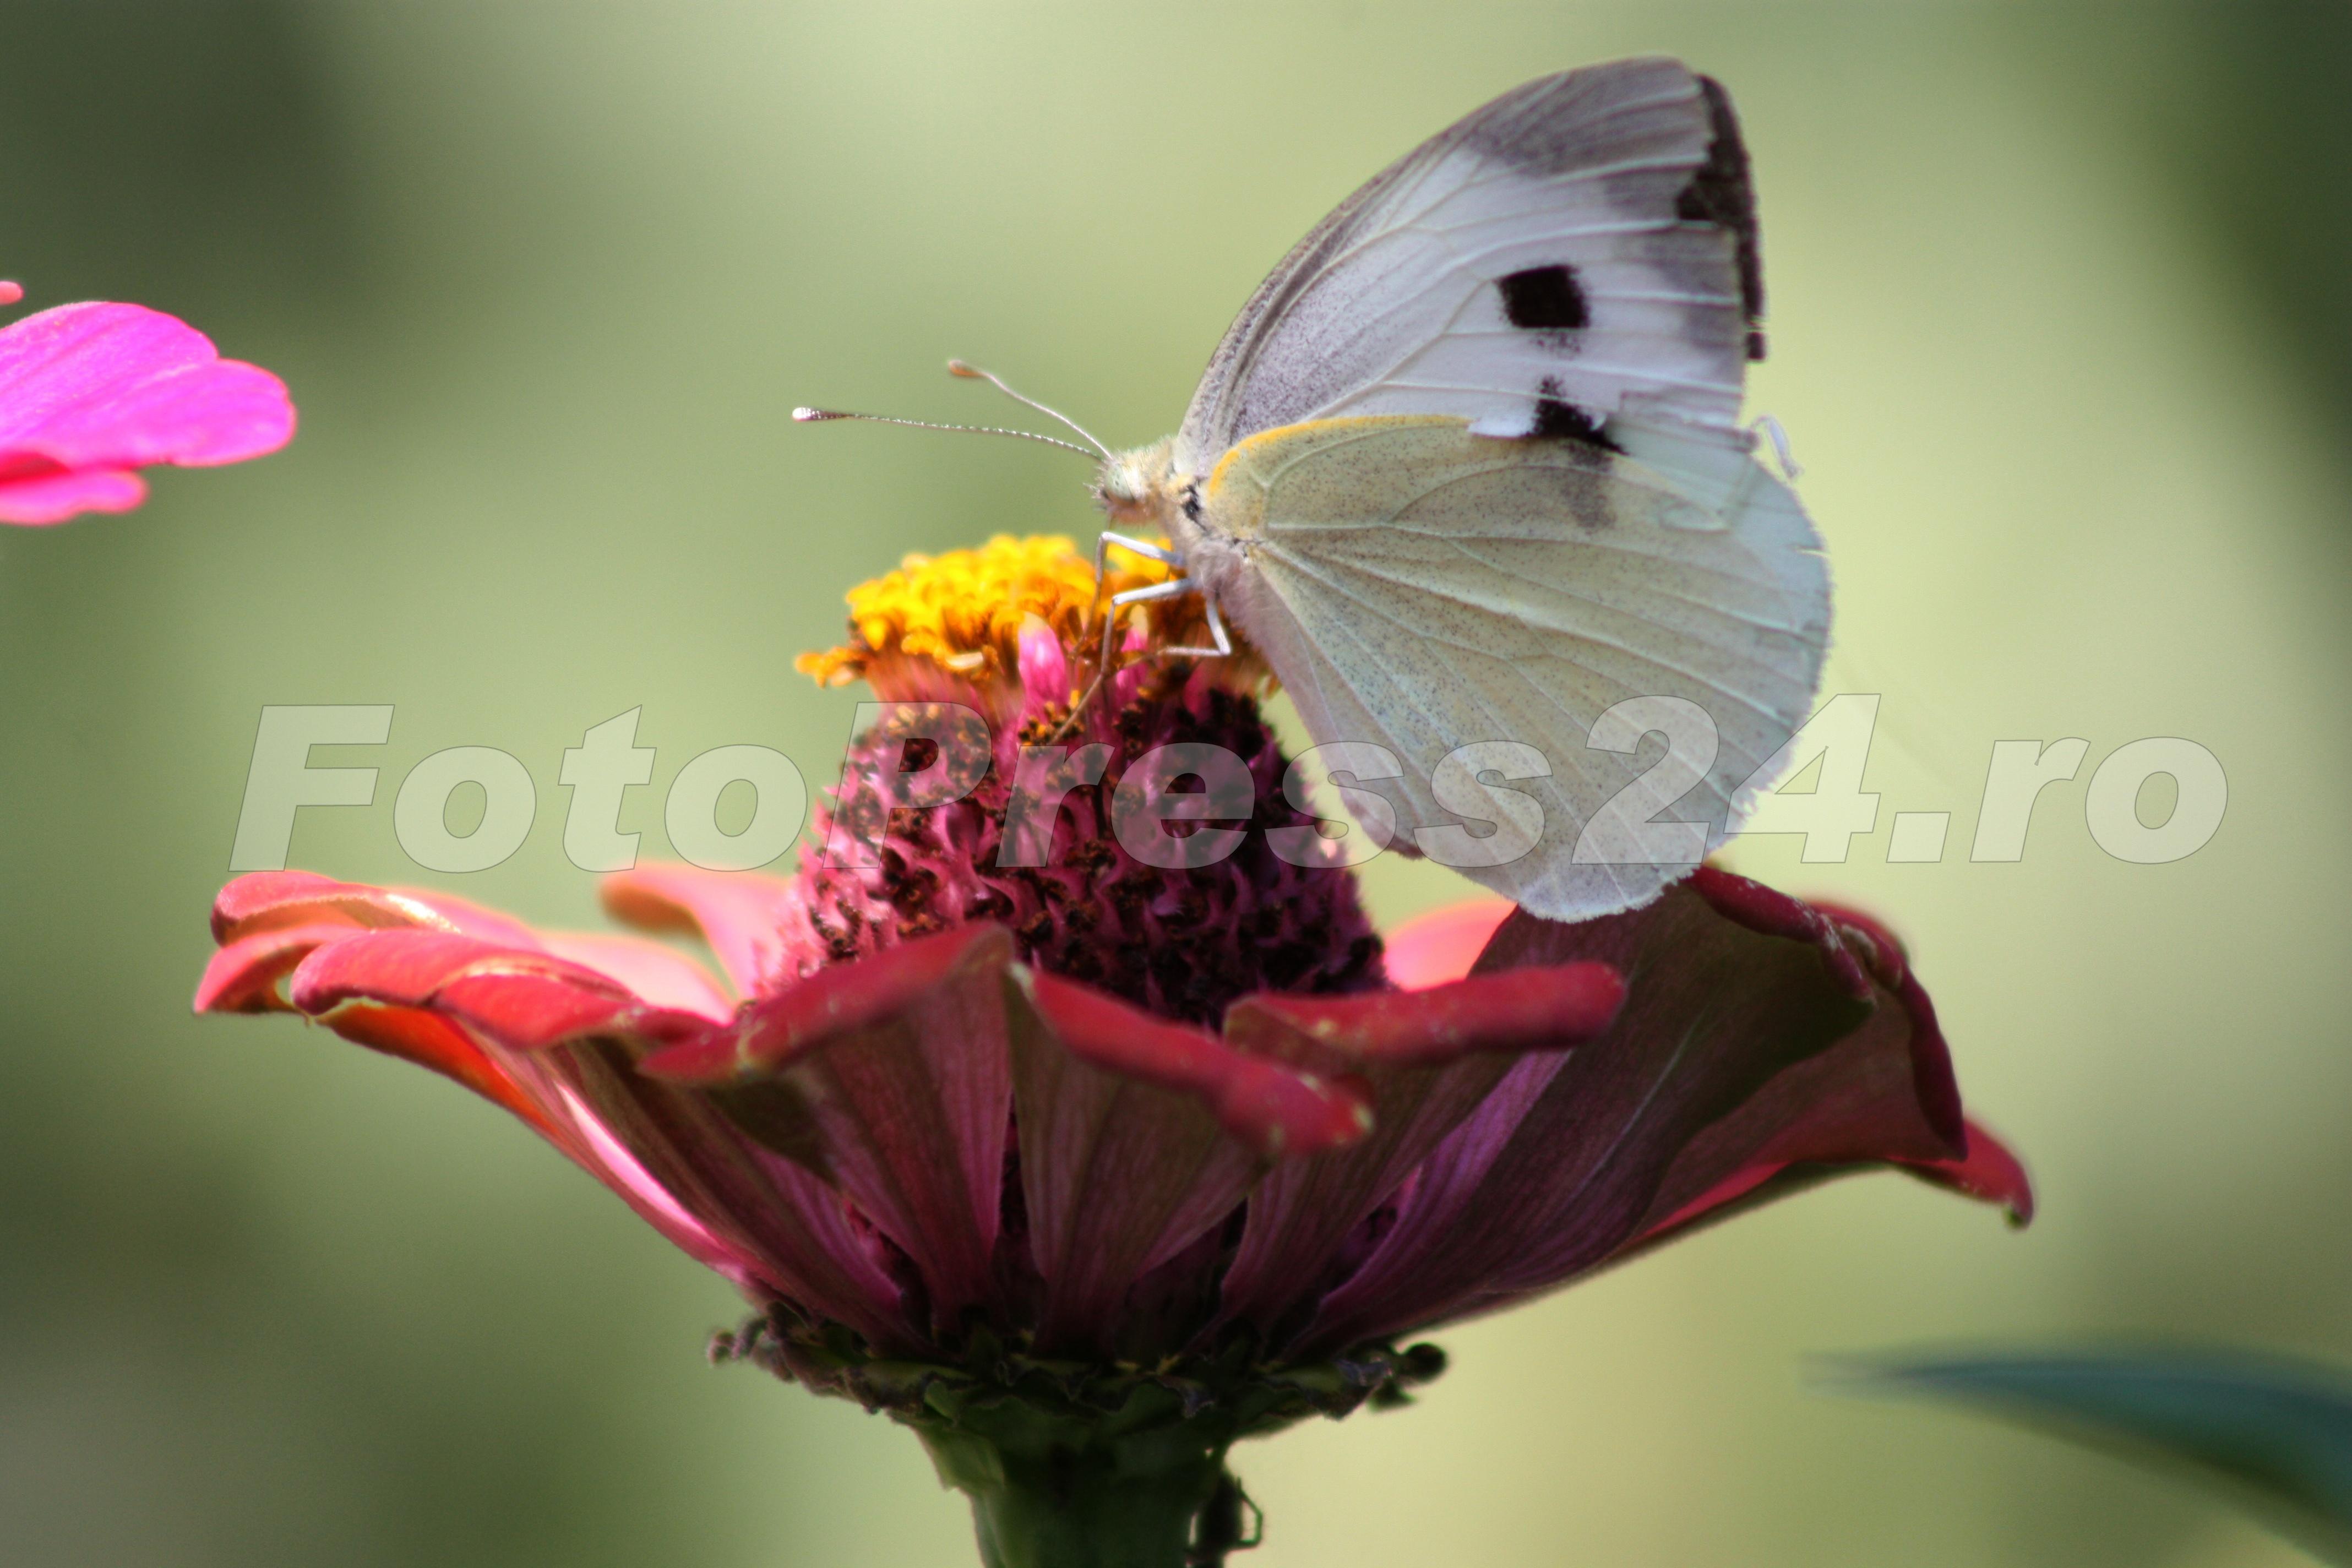 flori-FotoPress-24.ro-1